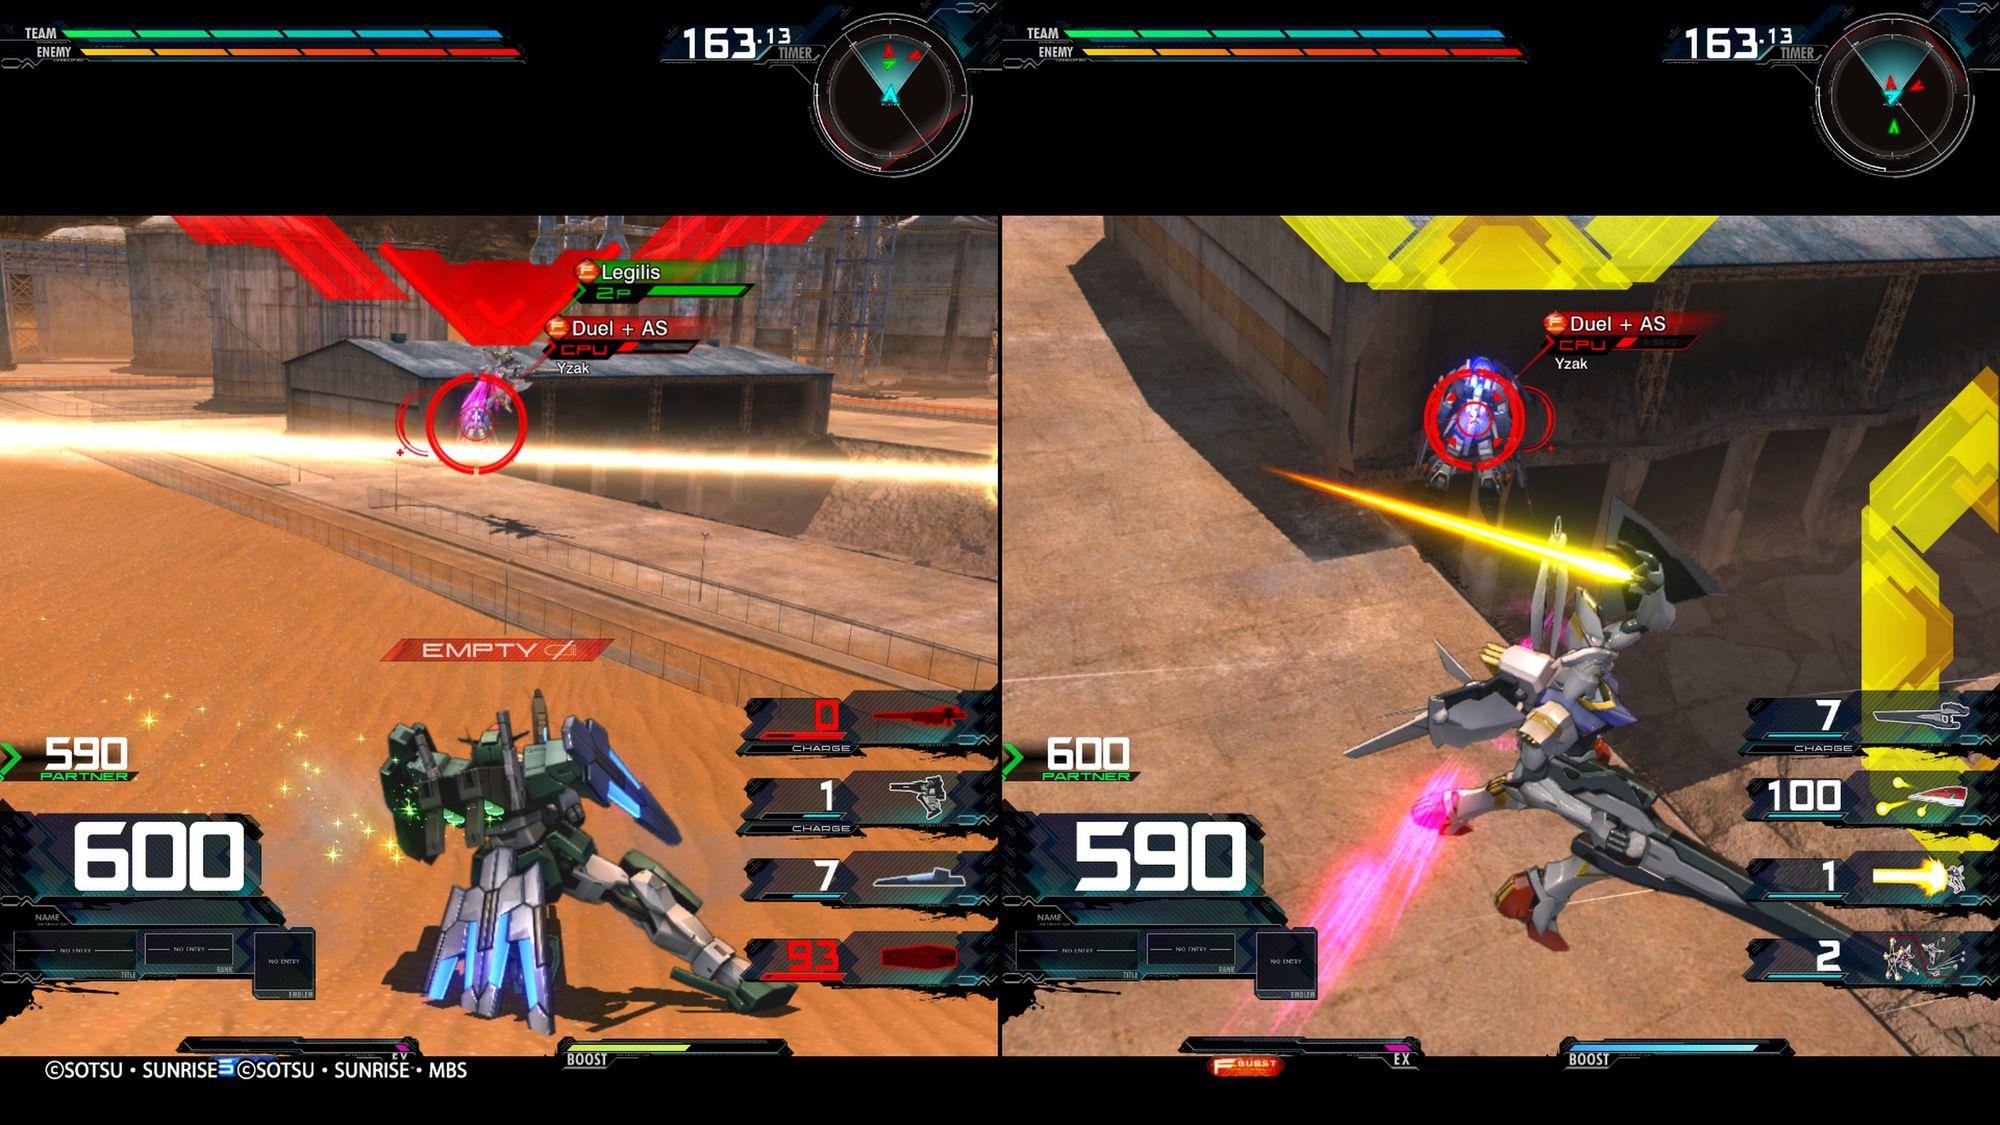 Cherudim Gundam e Legilis Gundam, split-screen multiplayer